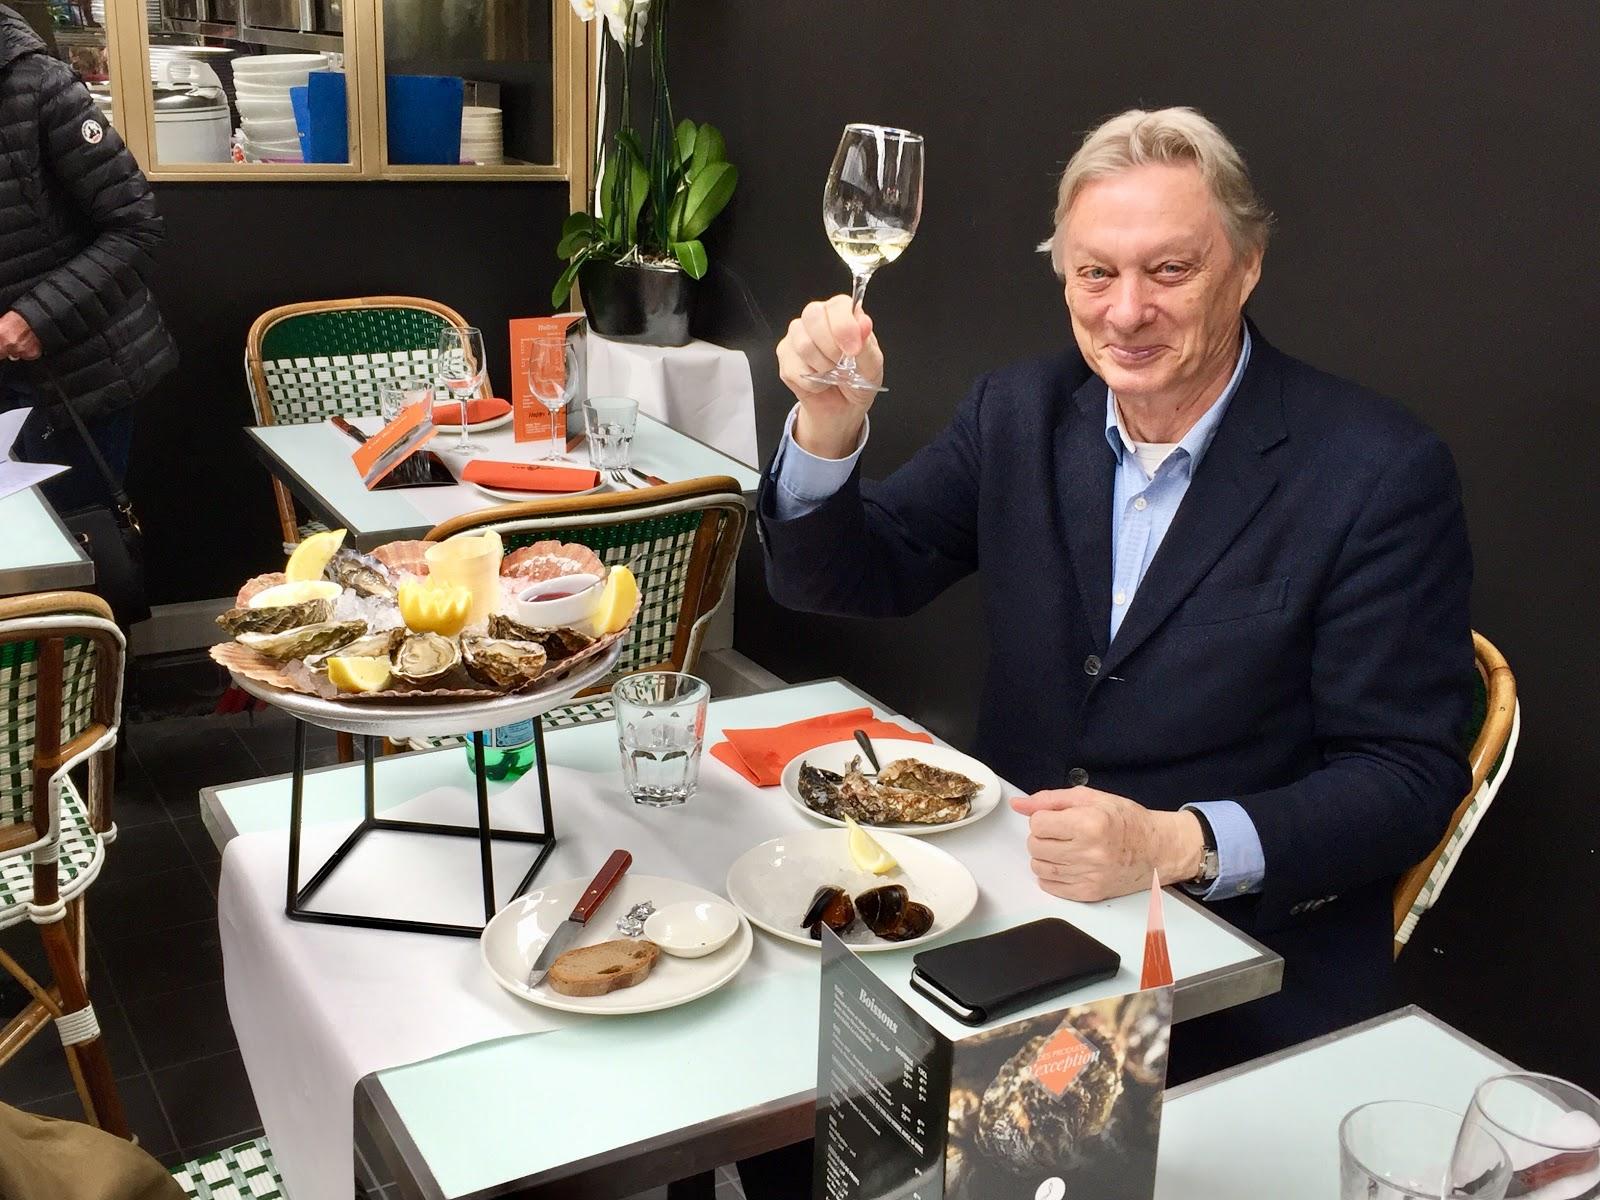 A contented diner in Le Café de Turin